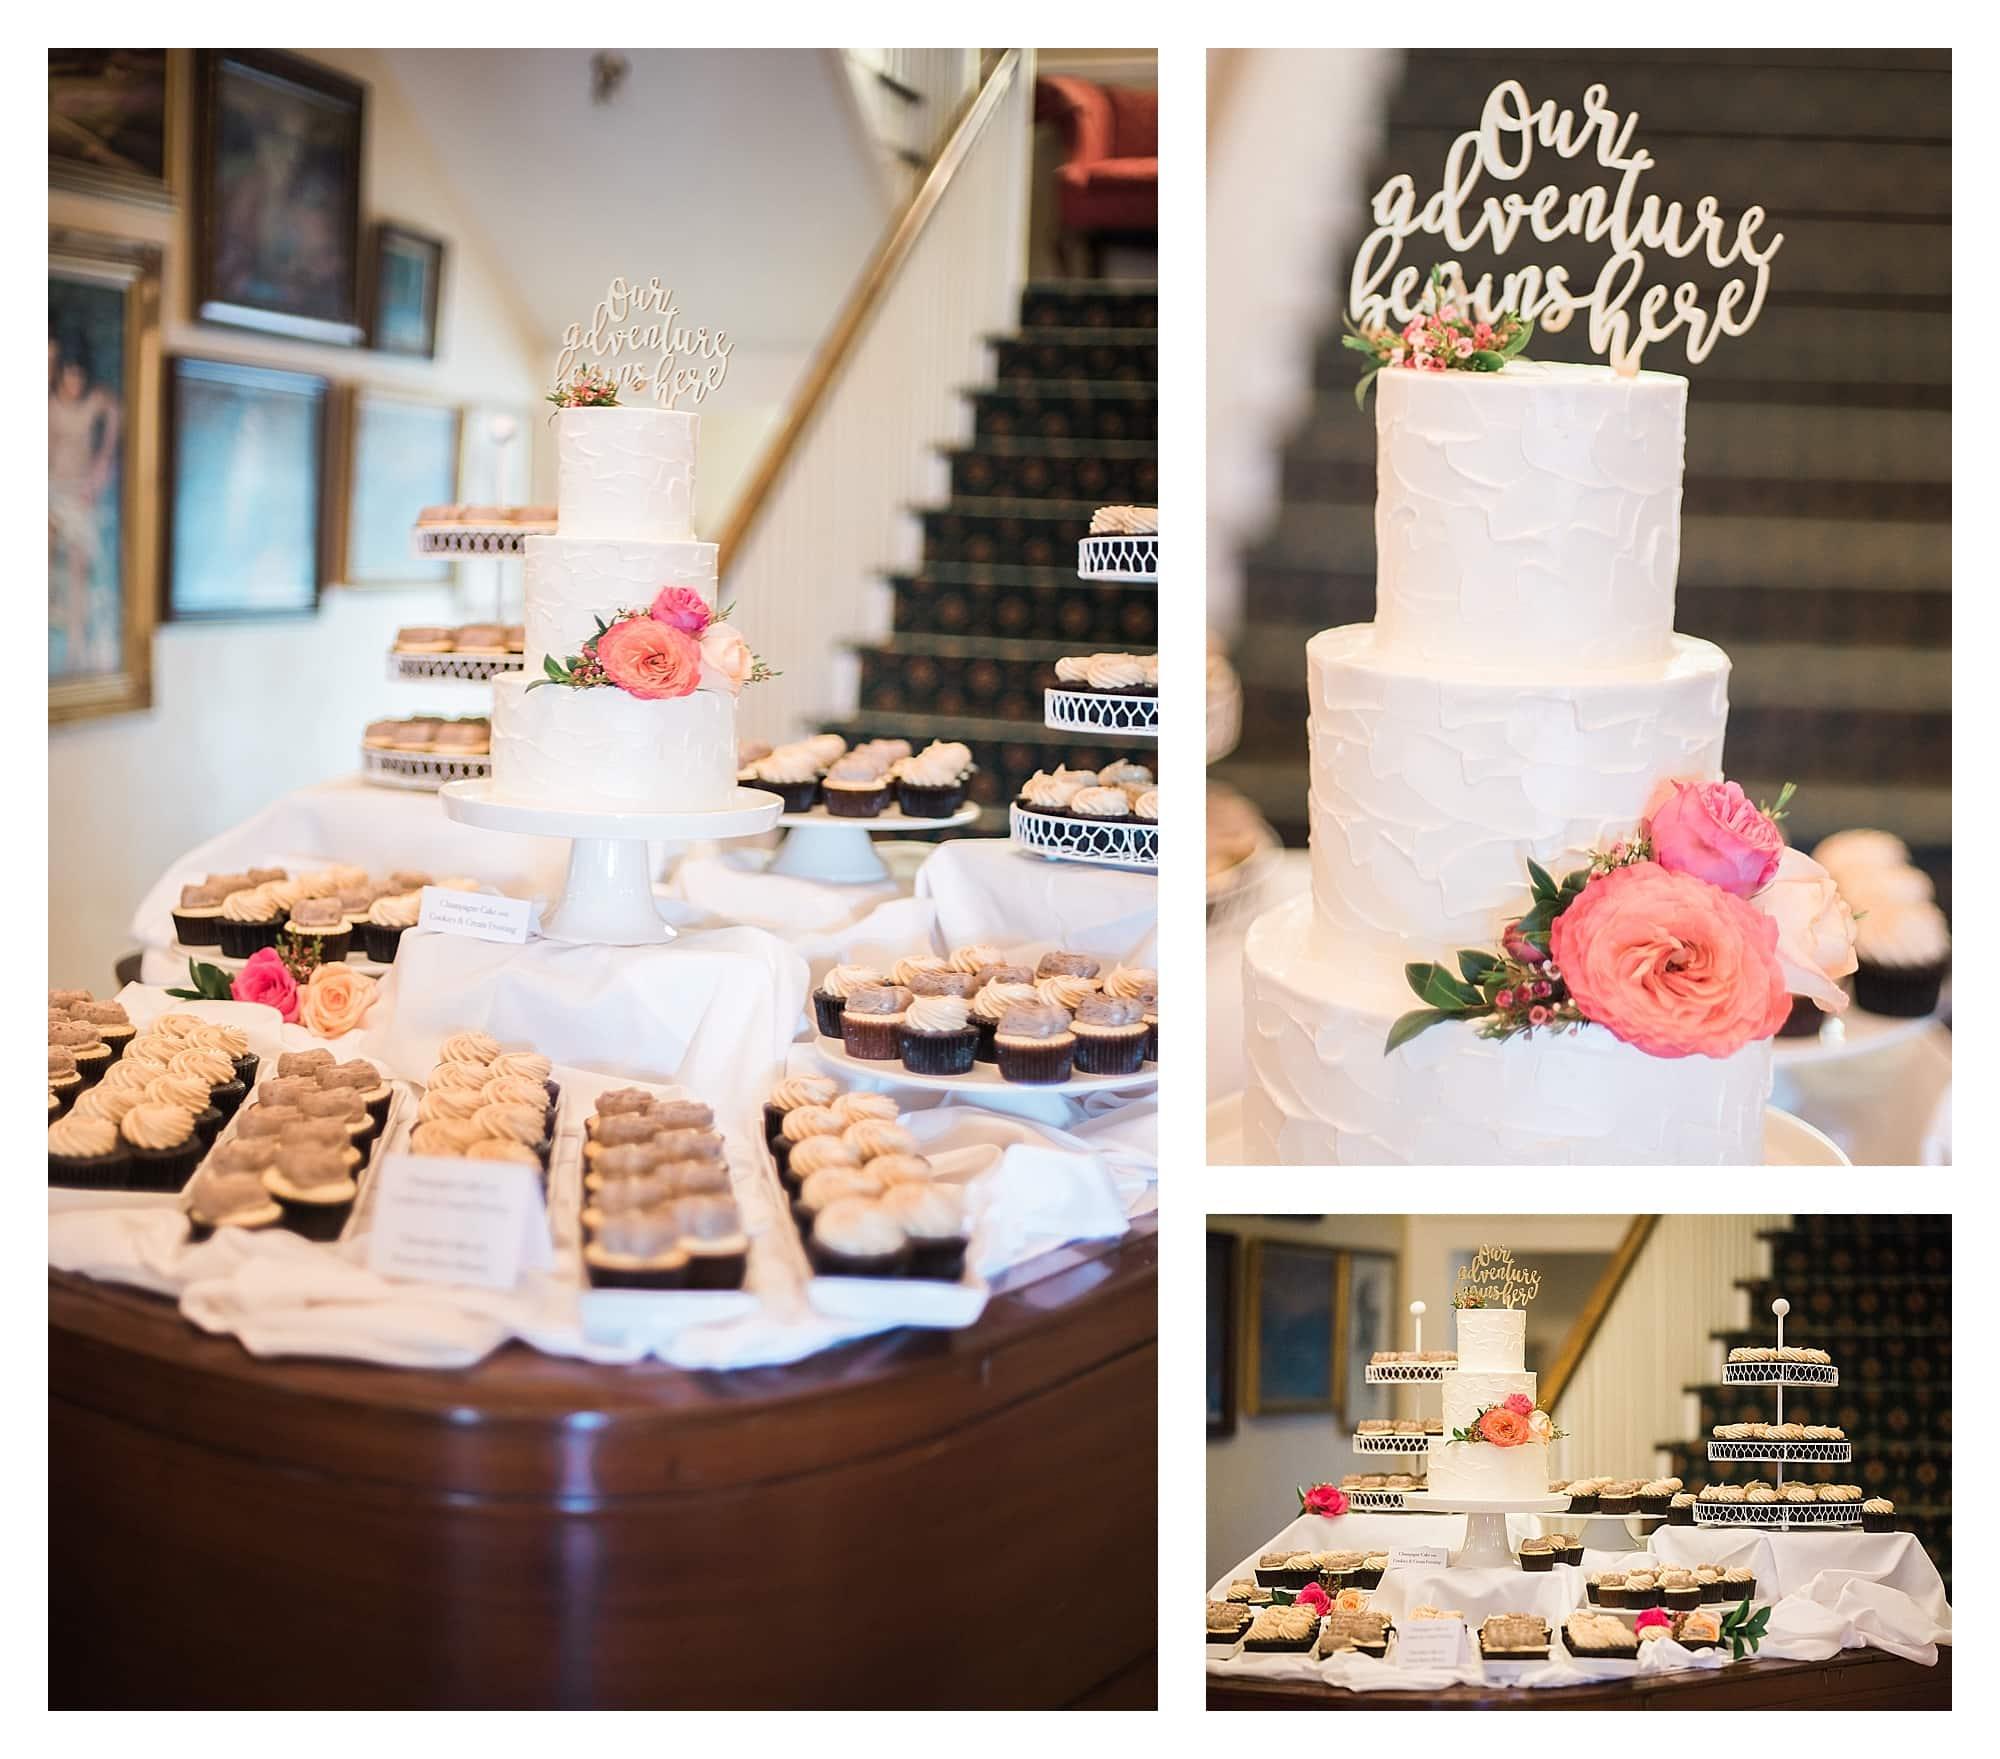 Mini cupcakes and wedding cake on piano display